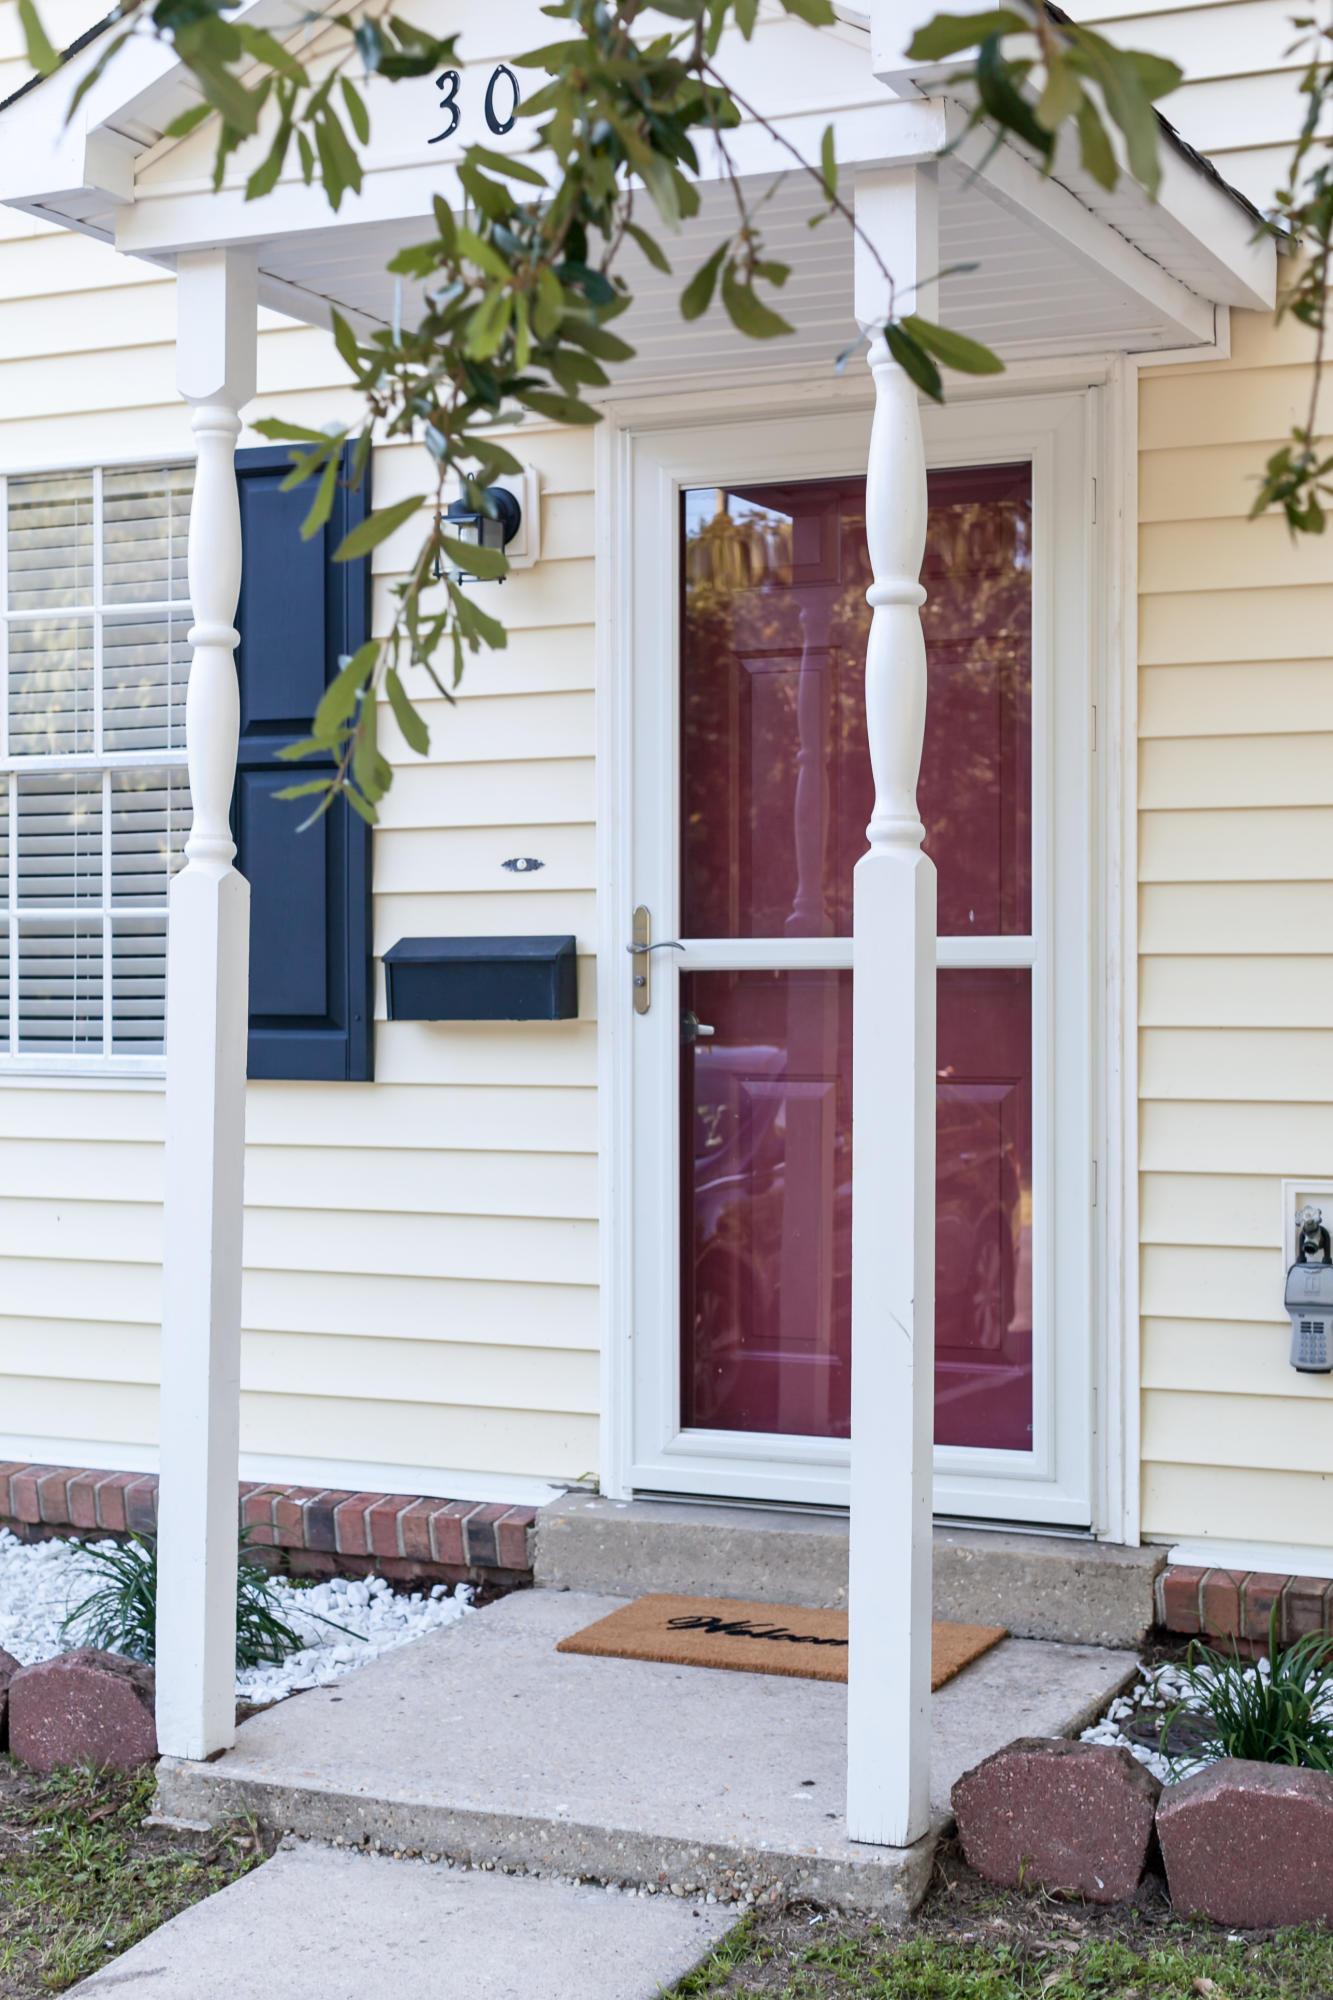 Heritage Village Homes For Sale - 303 Lakeside, Mount Pleasant, SC - 0